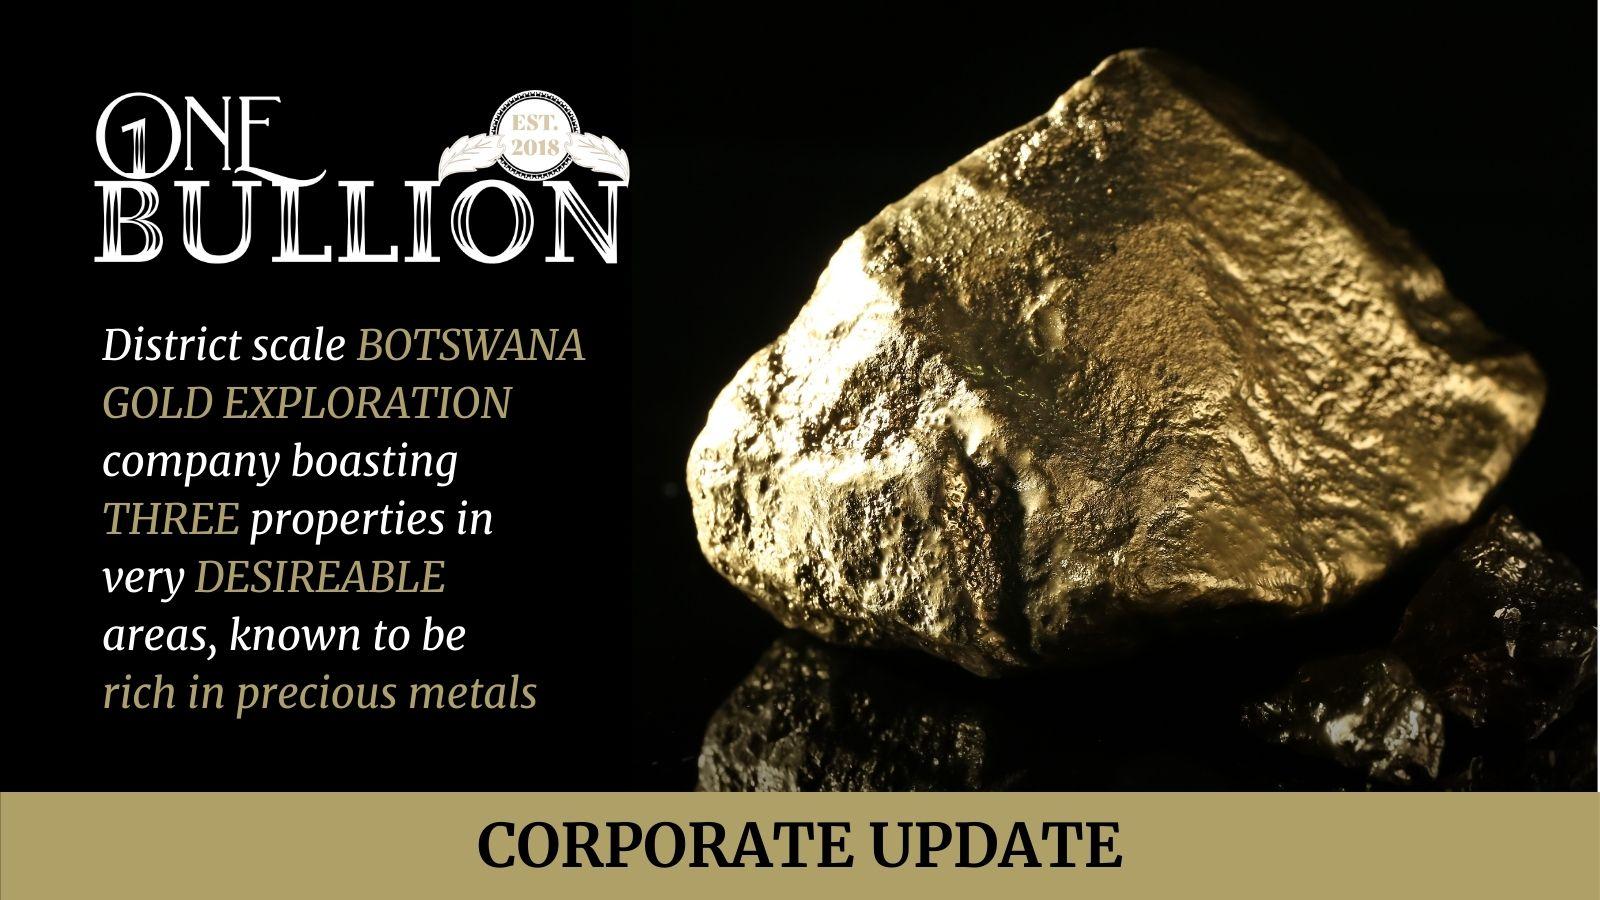 One Bullion Corporate Announcement